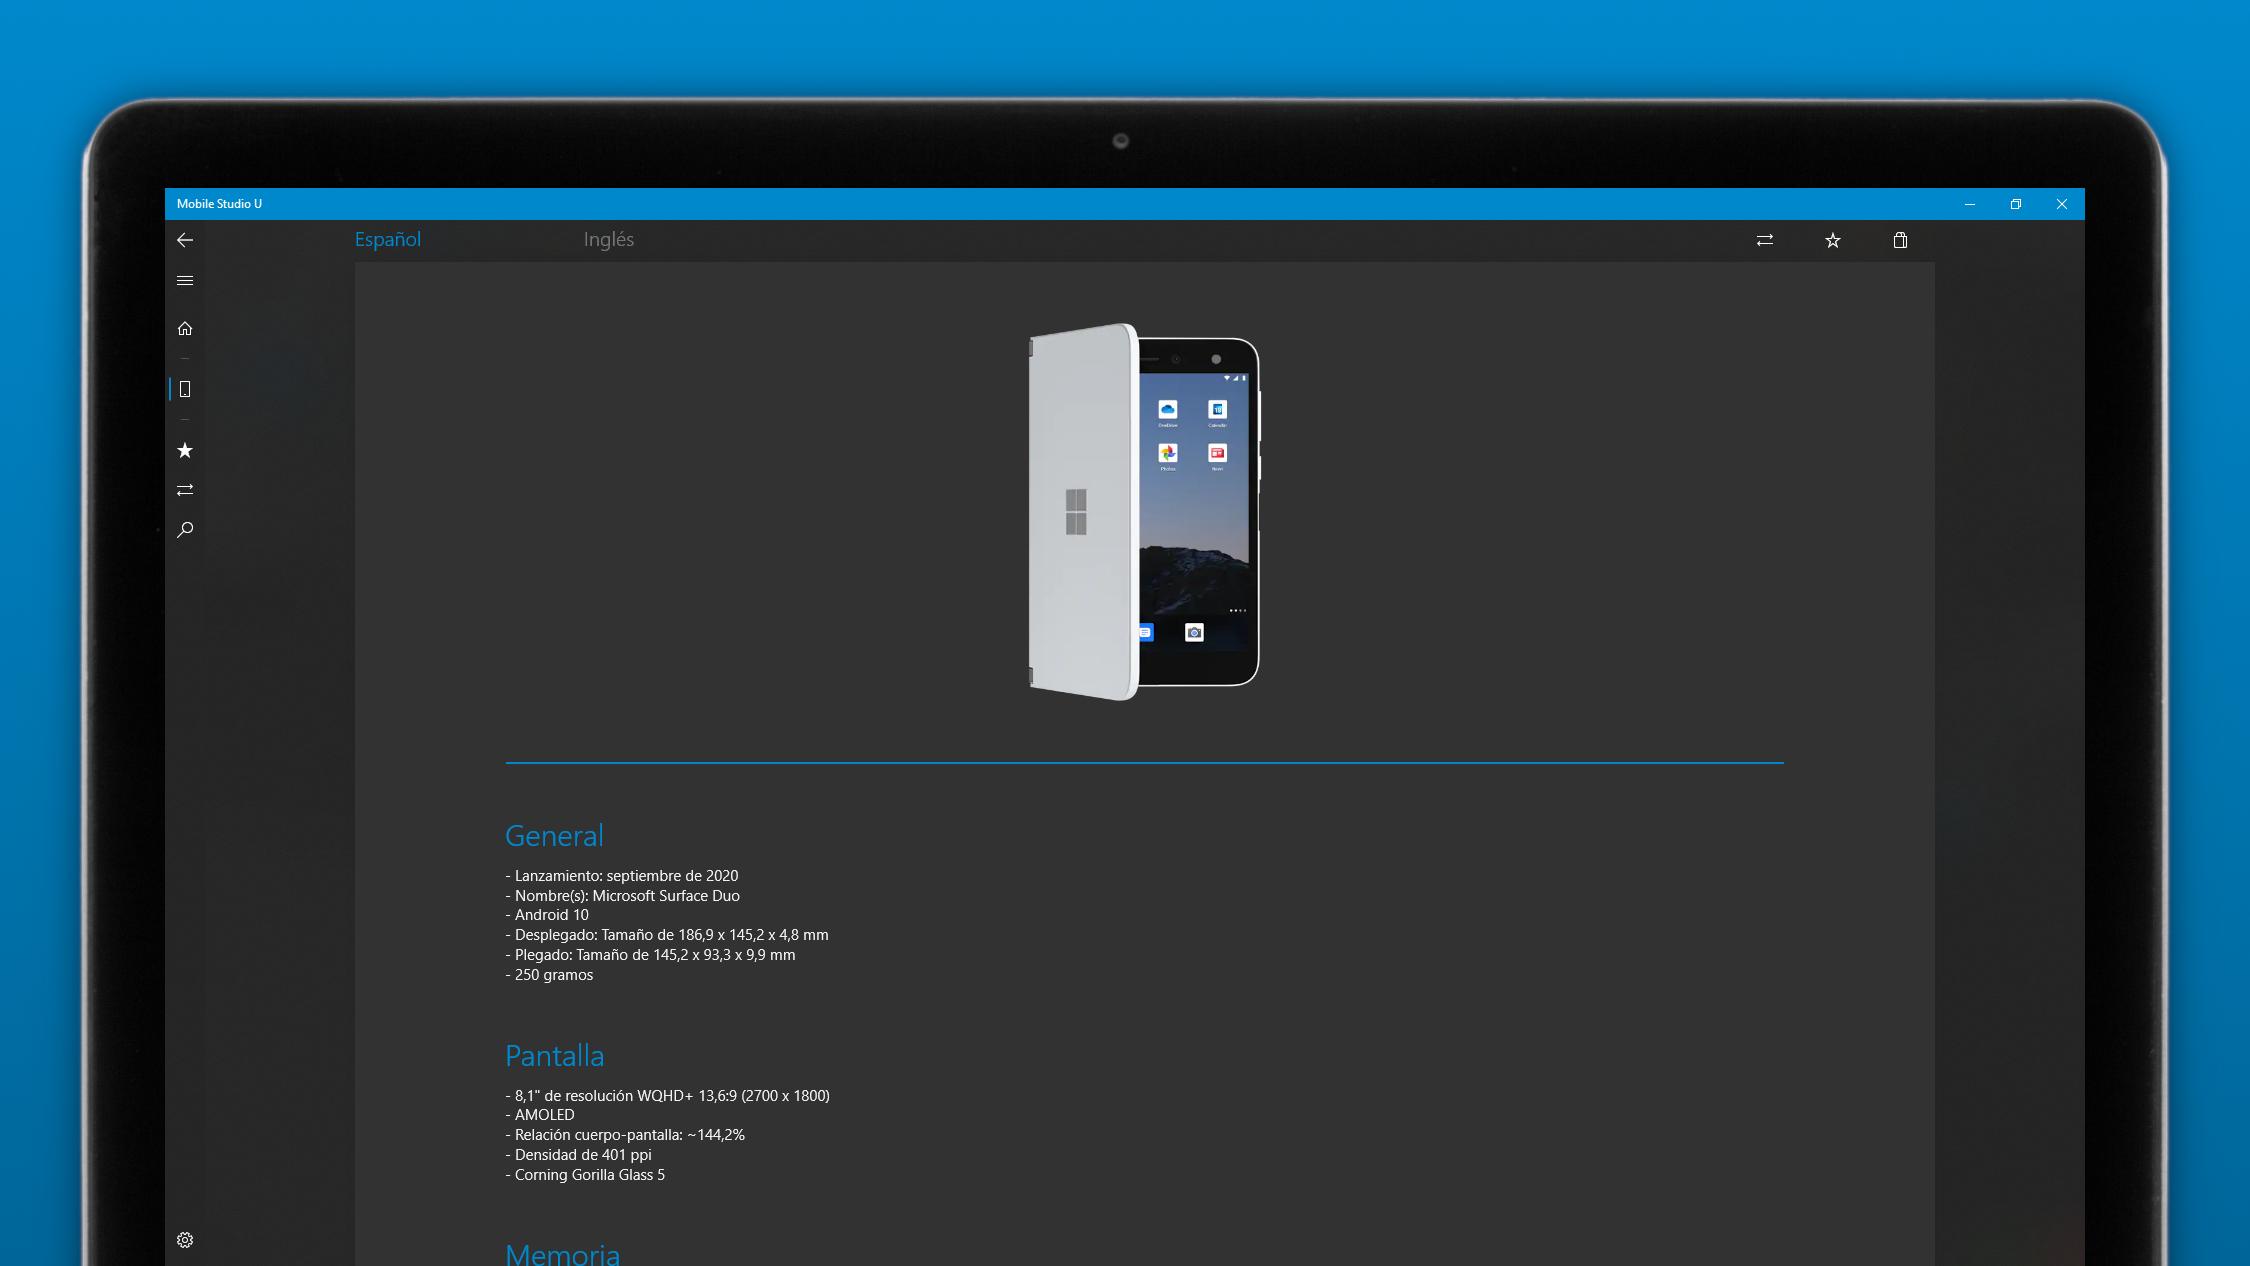 https://uares.blob.core.windows.net/app-mobilestudio/MobileStudio_PC_ES_3.png